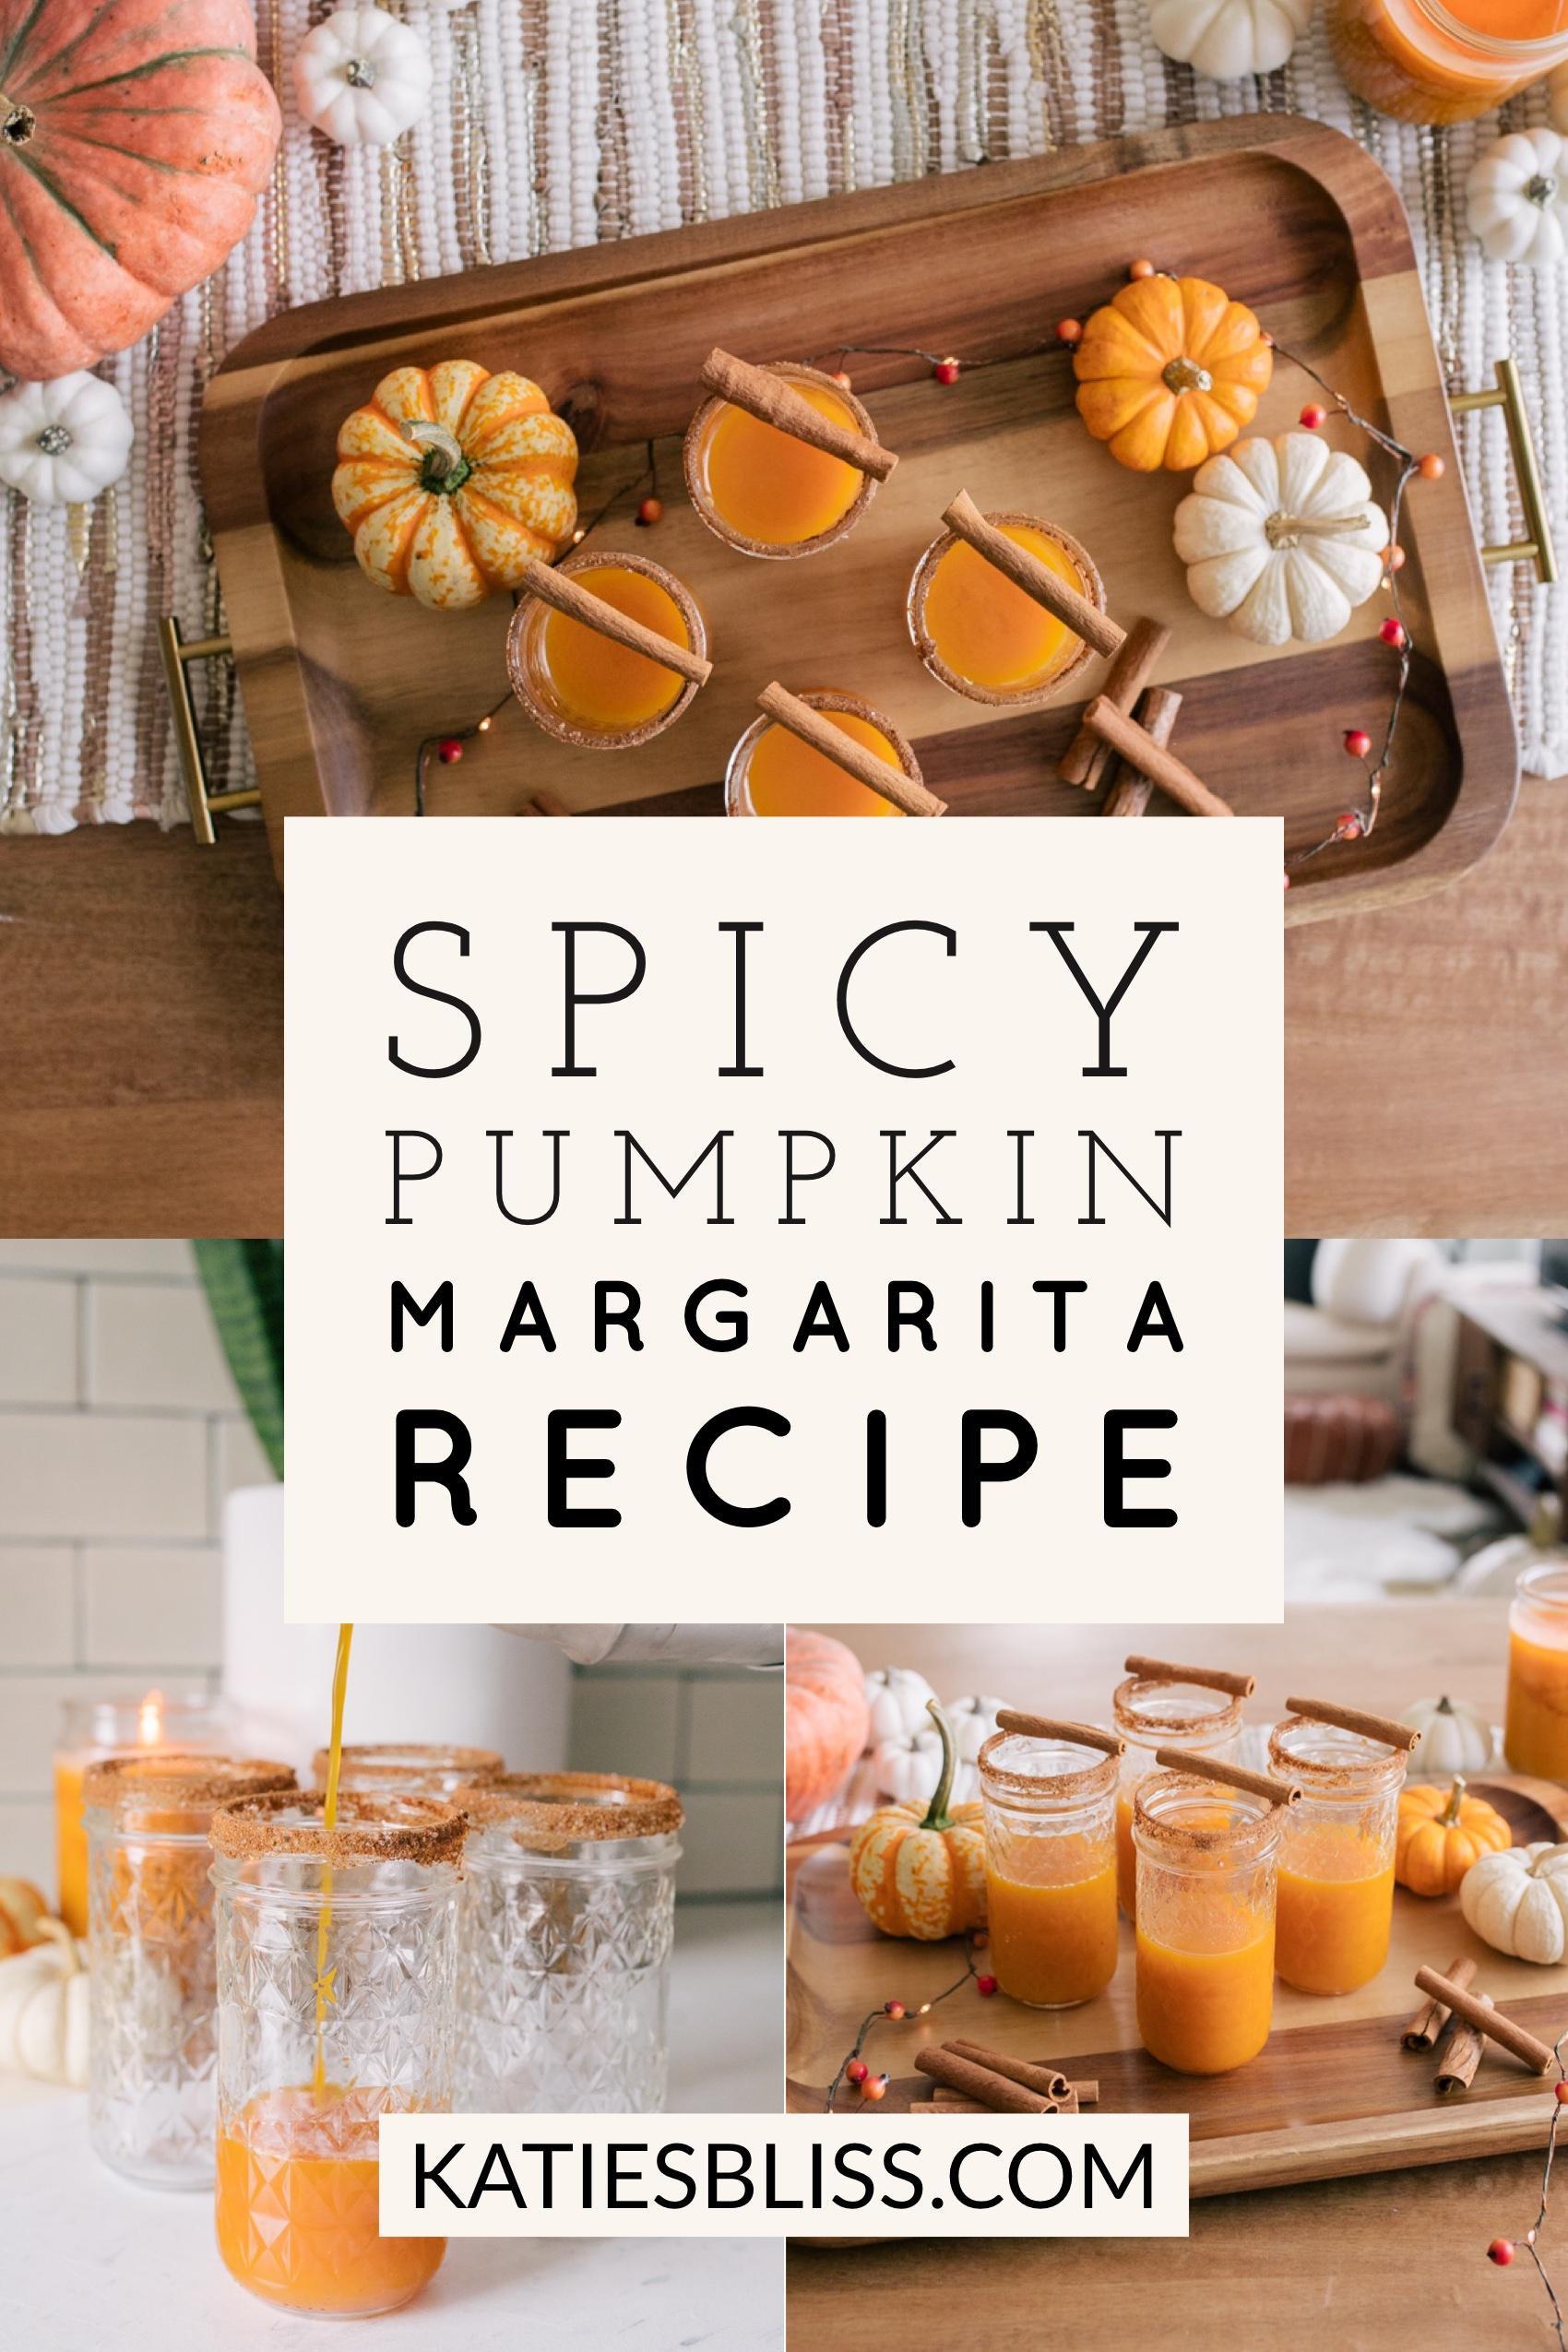 Spicy Pumpkin Margarita Recipe